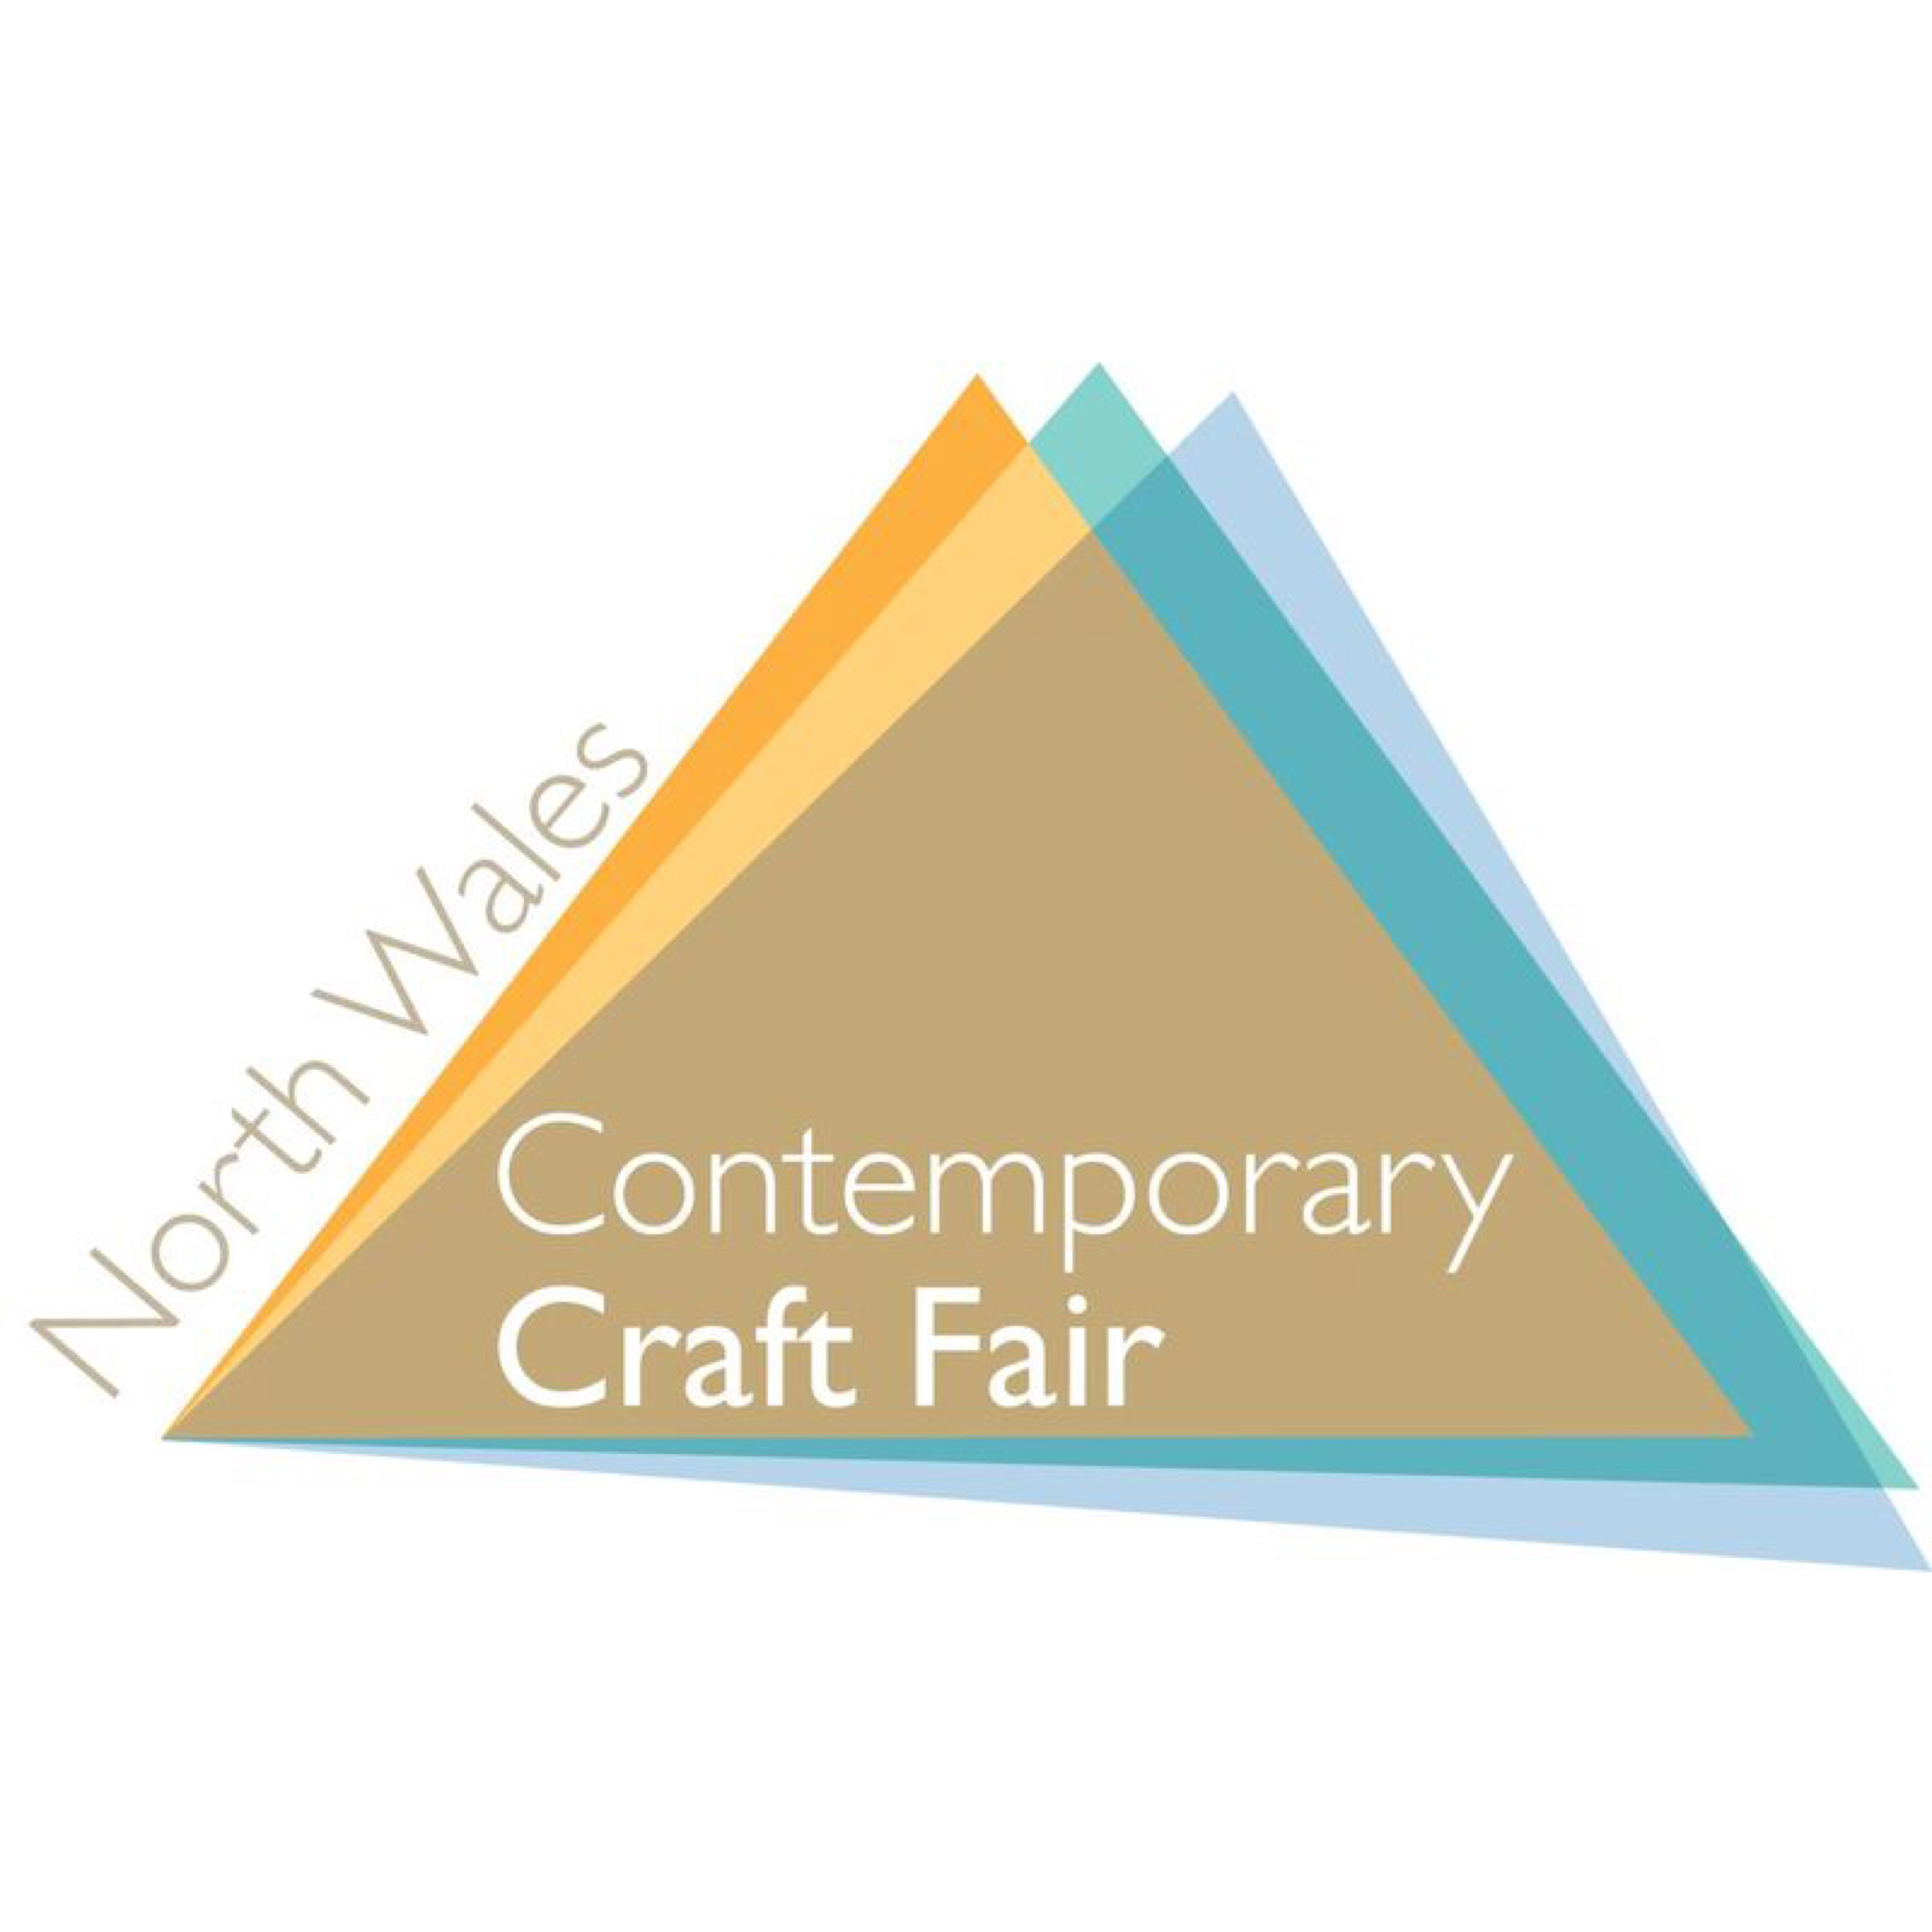 North Wales Contemporary Craft Fair Winter 2019 Image #0